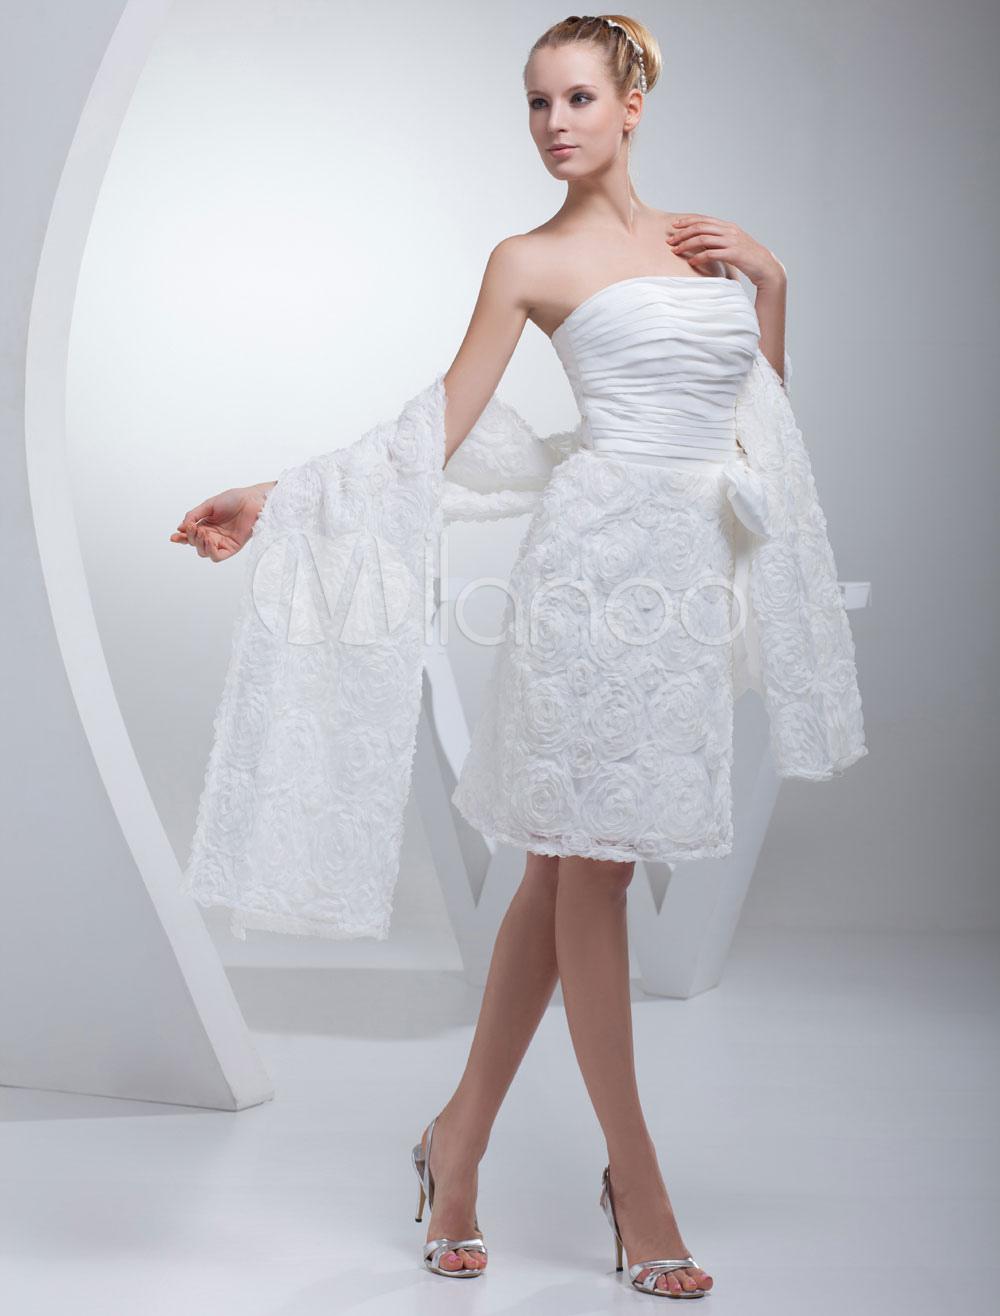 Reception Wedding Dress Strapless Pleated Sash Bow Lace Flower Short Length Sheath Bridal Dress (Cheap Wedding Dress) photo